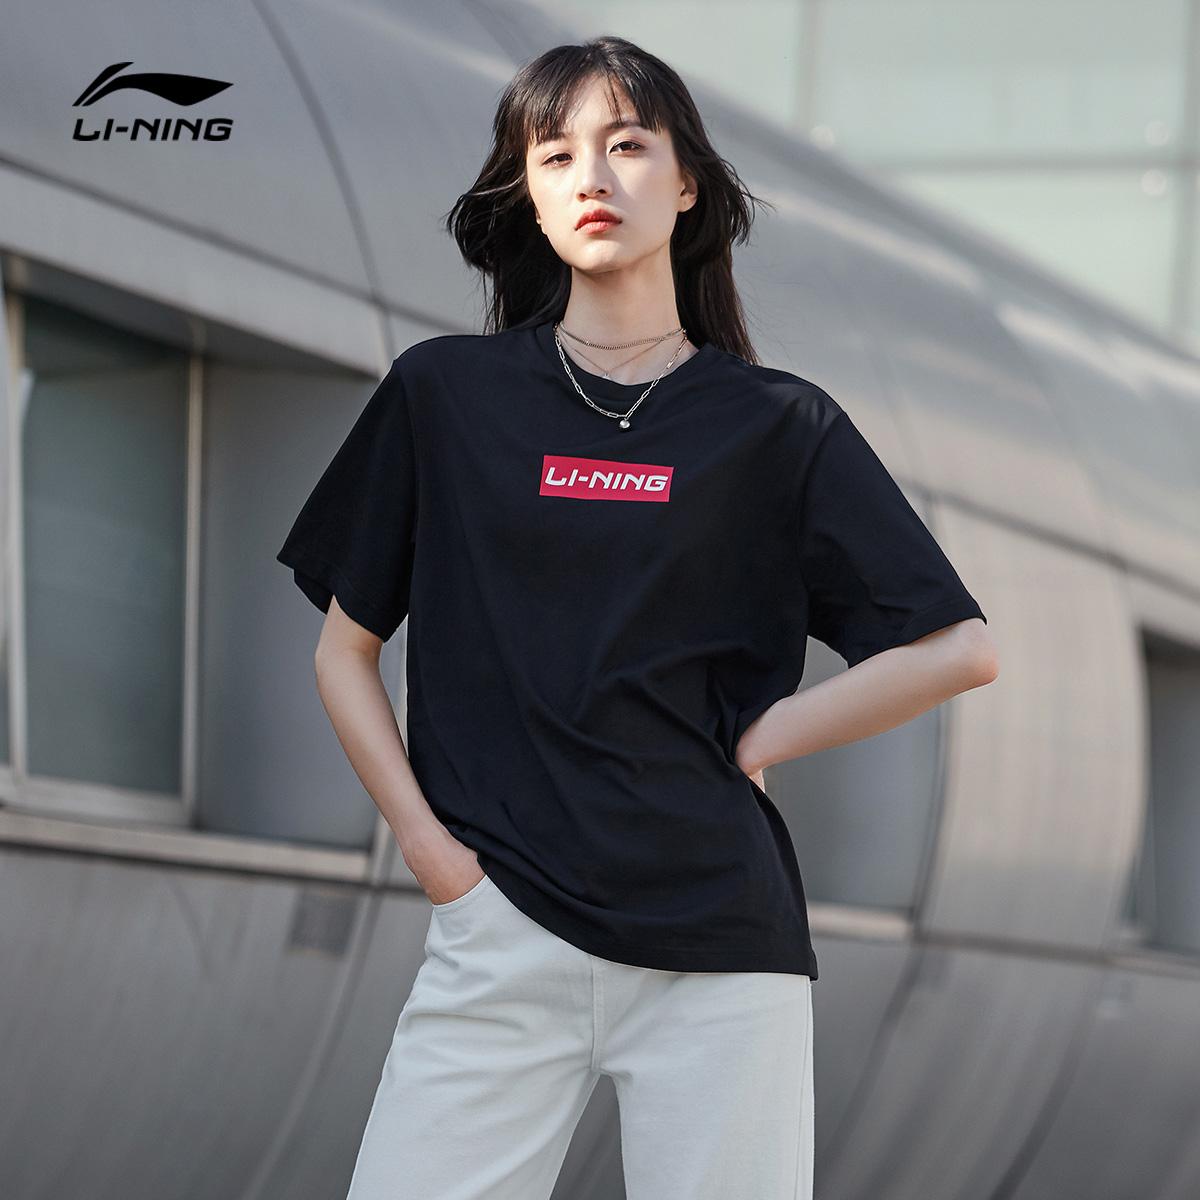 Li Ning short-sleeved T-shirt mens white flagship new summer couple dress casual top sportswear womens loose culture shirt